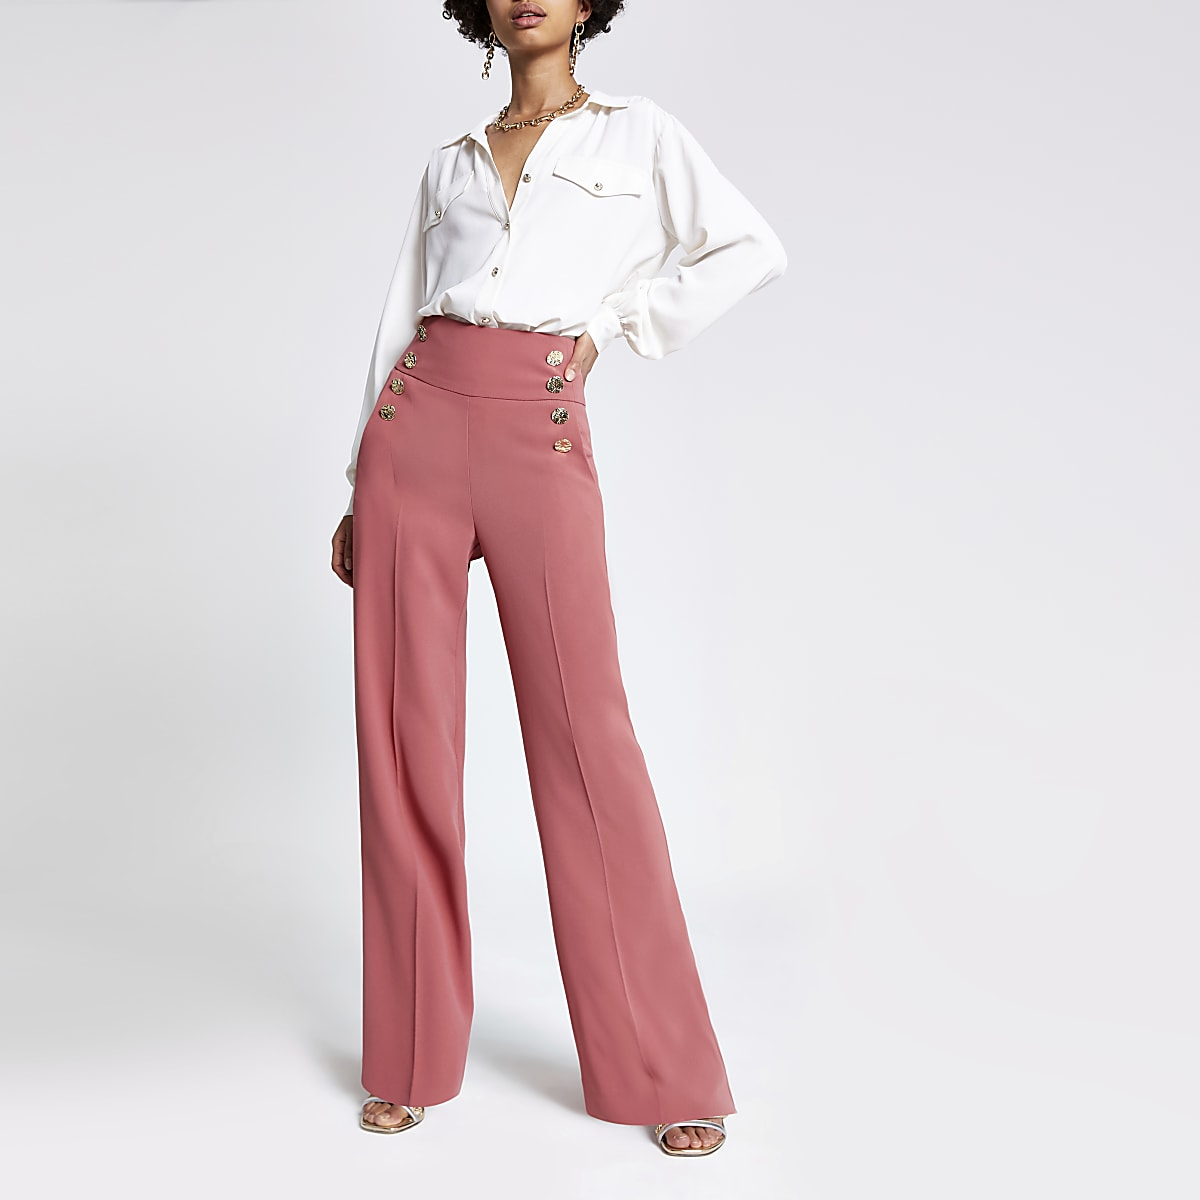 Dark pink wide leg pants